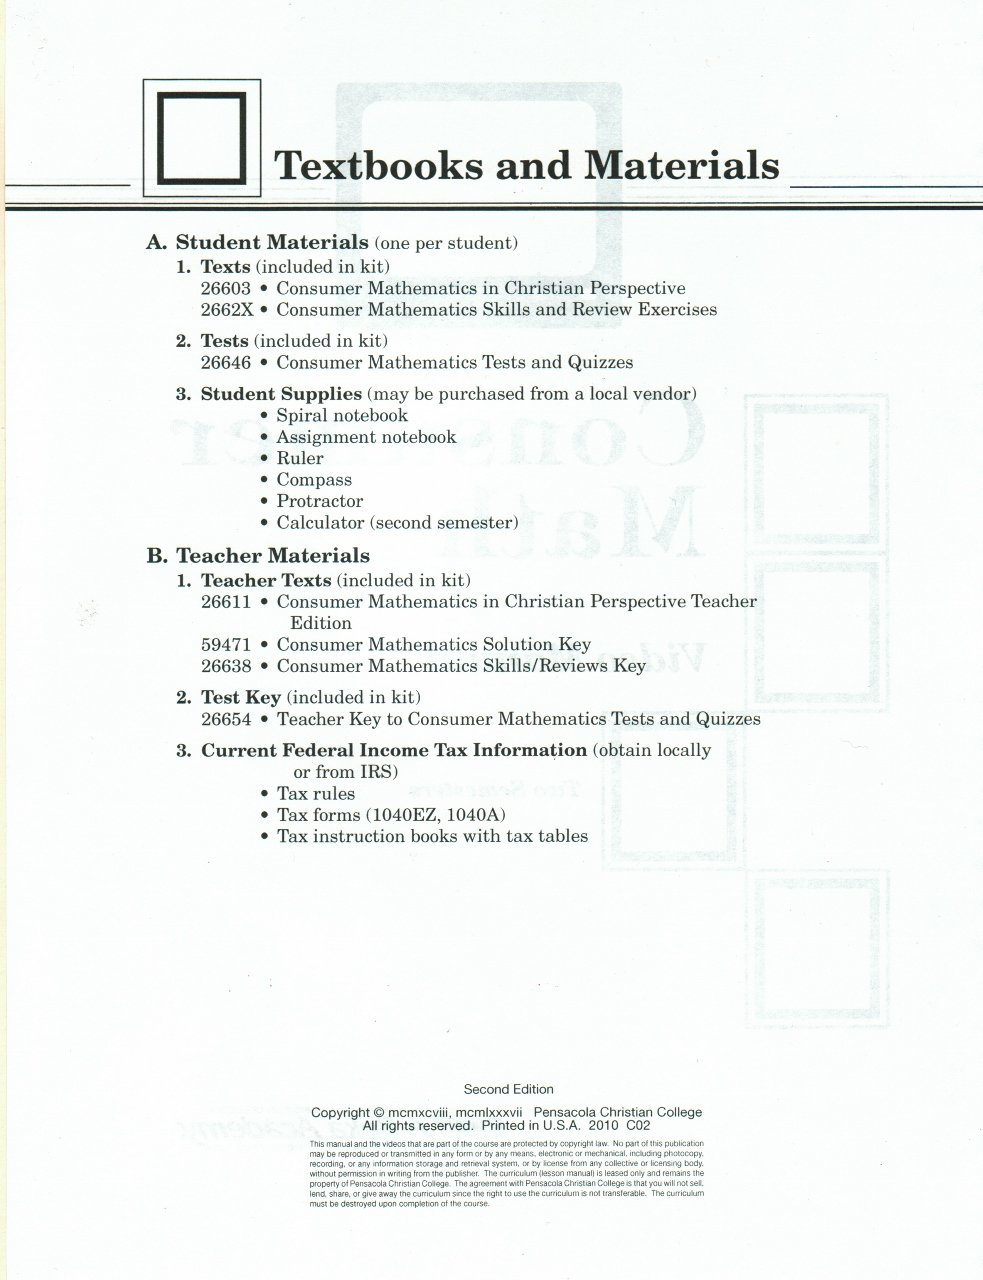 Video Manual for Consumer Math: Glenn Dickson: Amazon.com: Books